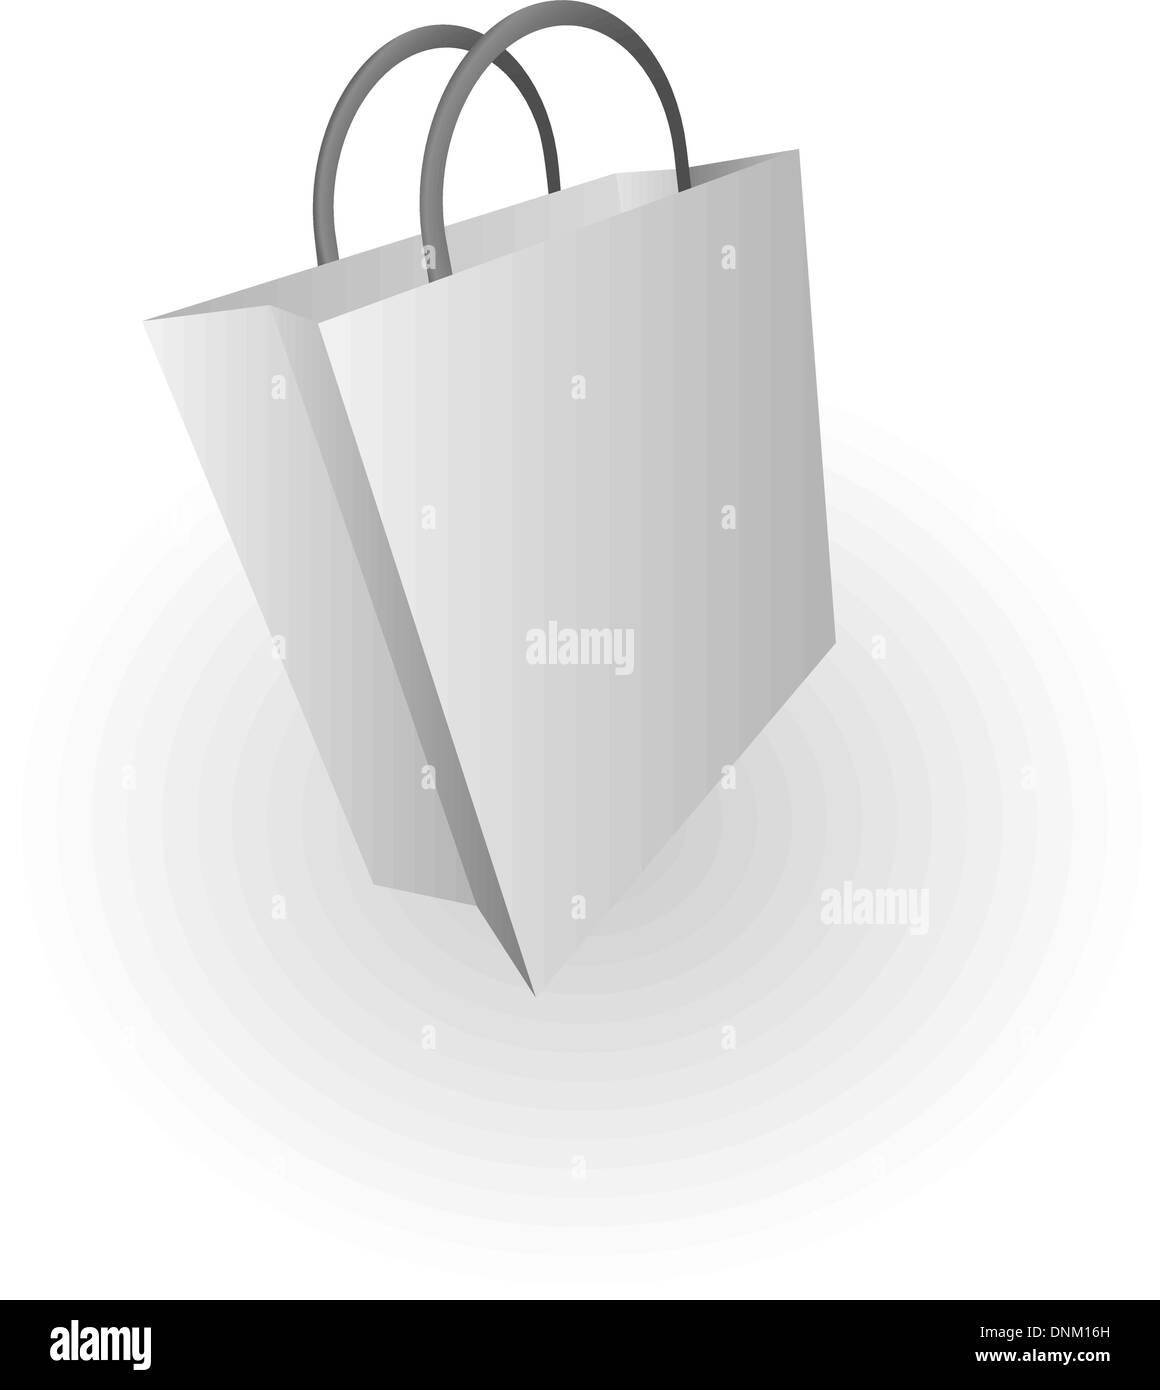 Illustration of silver shopping bag - Stock Vector